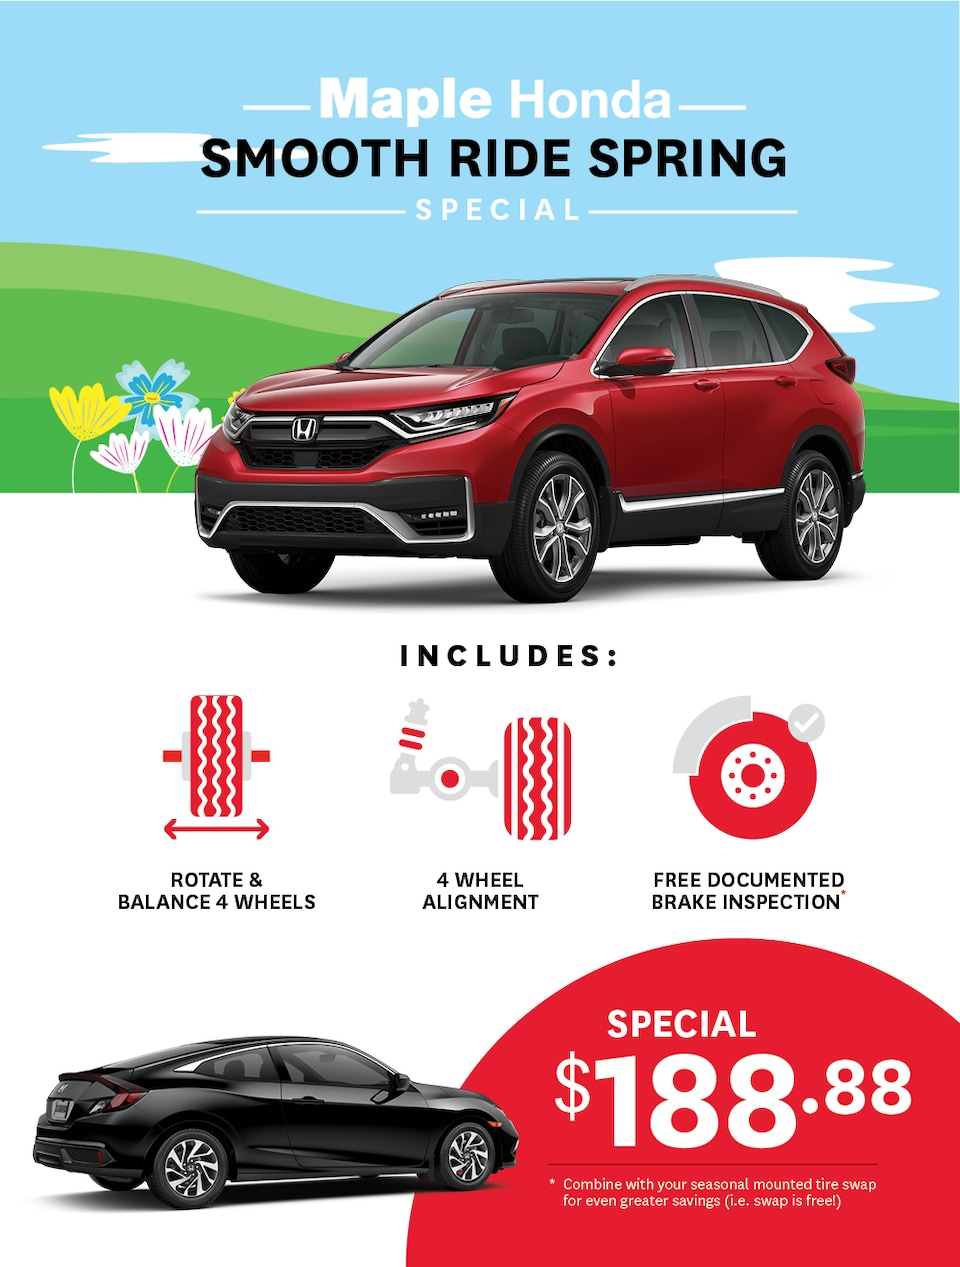 2021 Smooth Ride - Spring Service Campaign